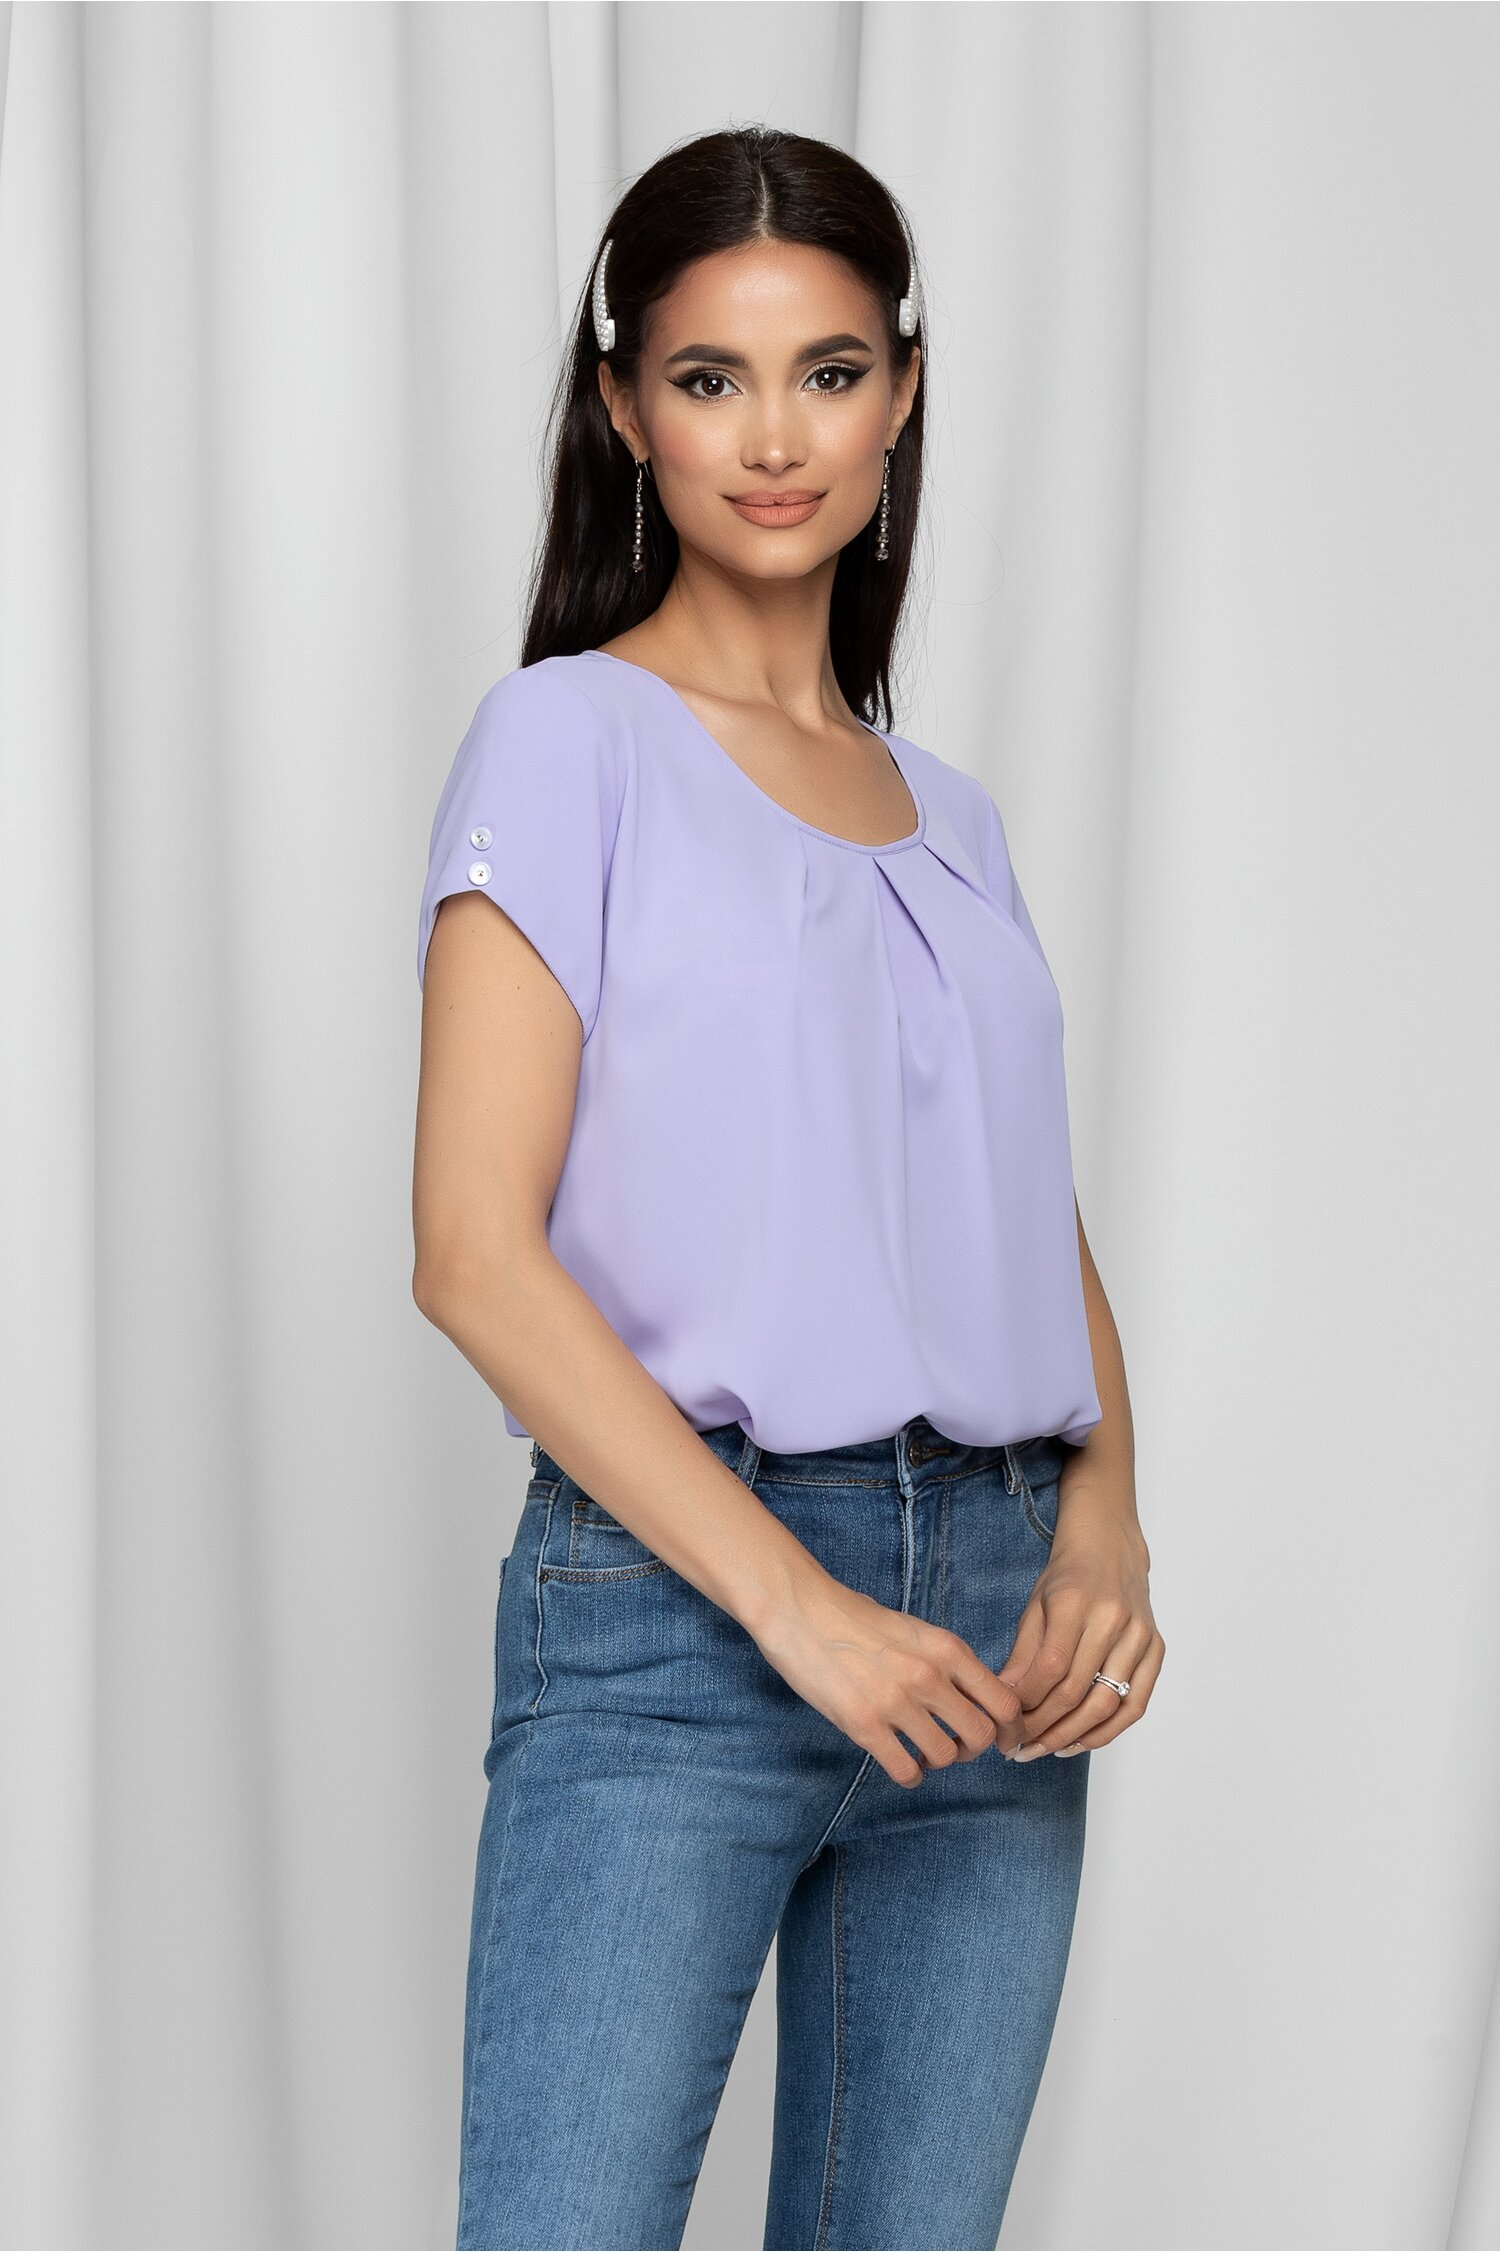 Bluza LaDonna lila cu pliuri la bust si nasturi decorativi pe maneci